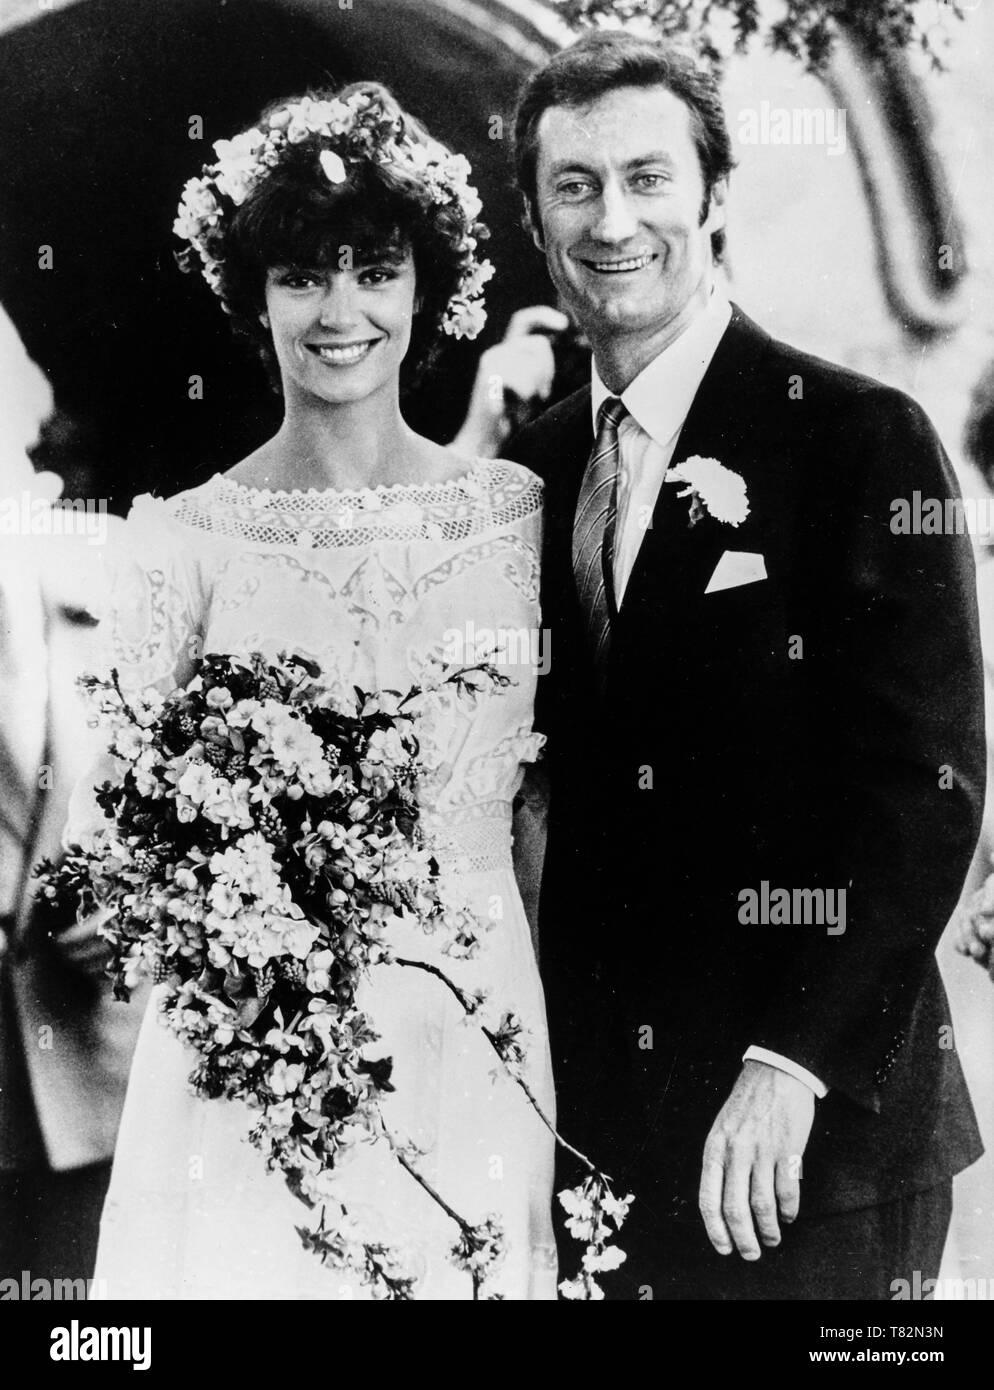 rachel ward, bryan brown, the good wife, 1987 Stock Photo - Alamy